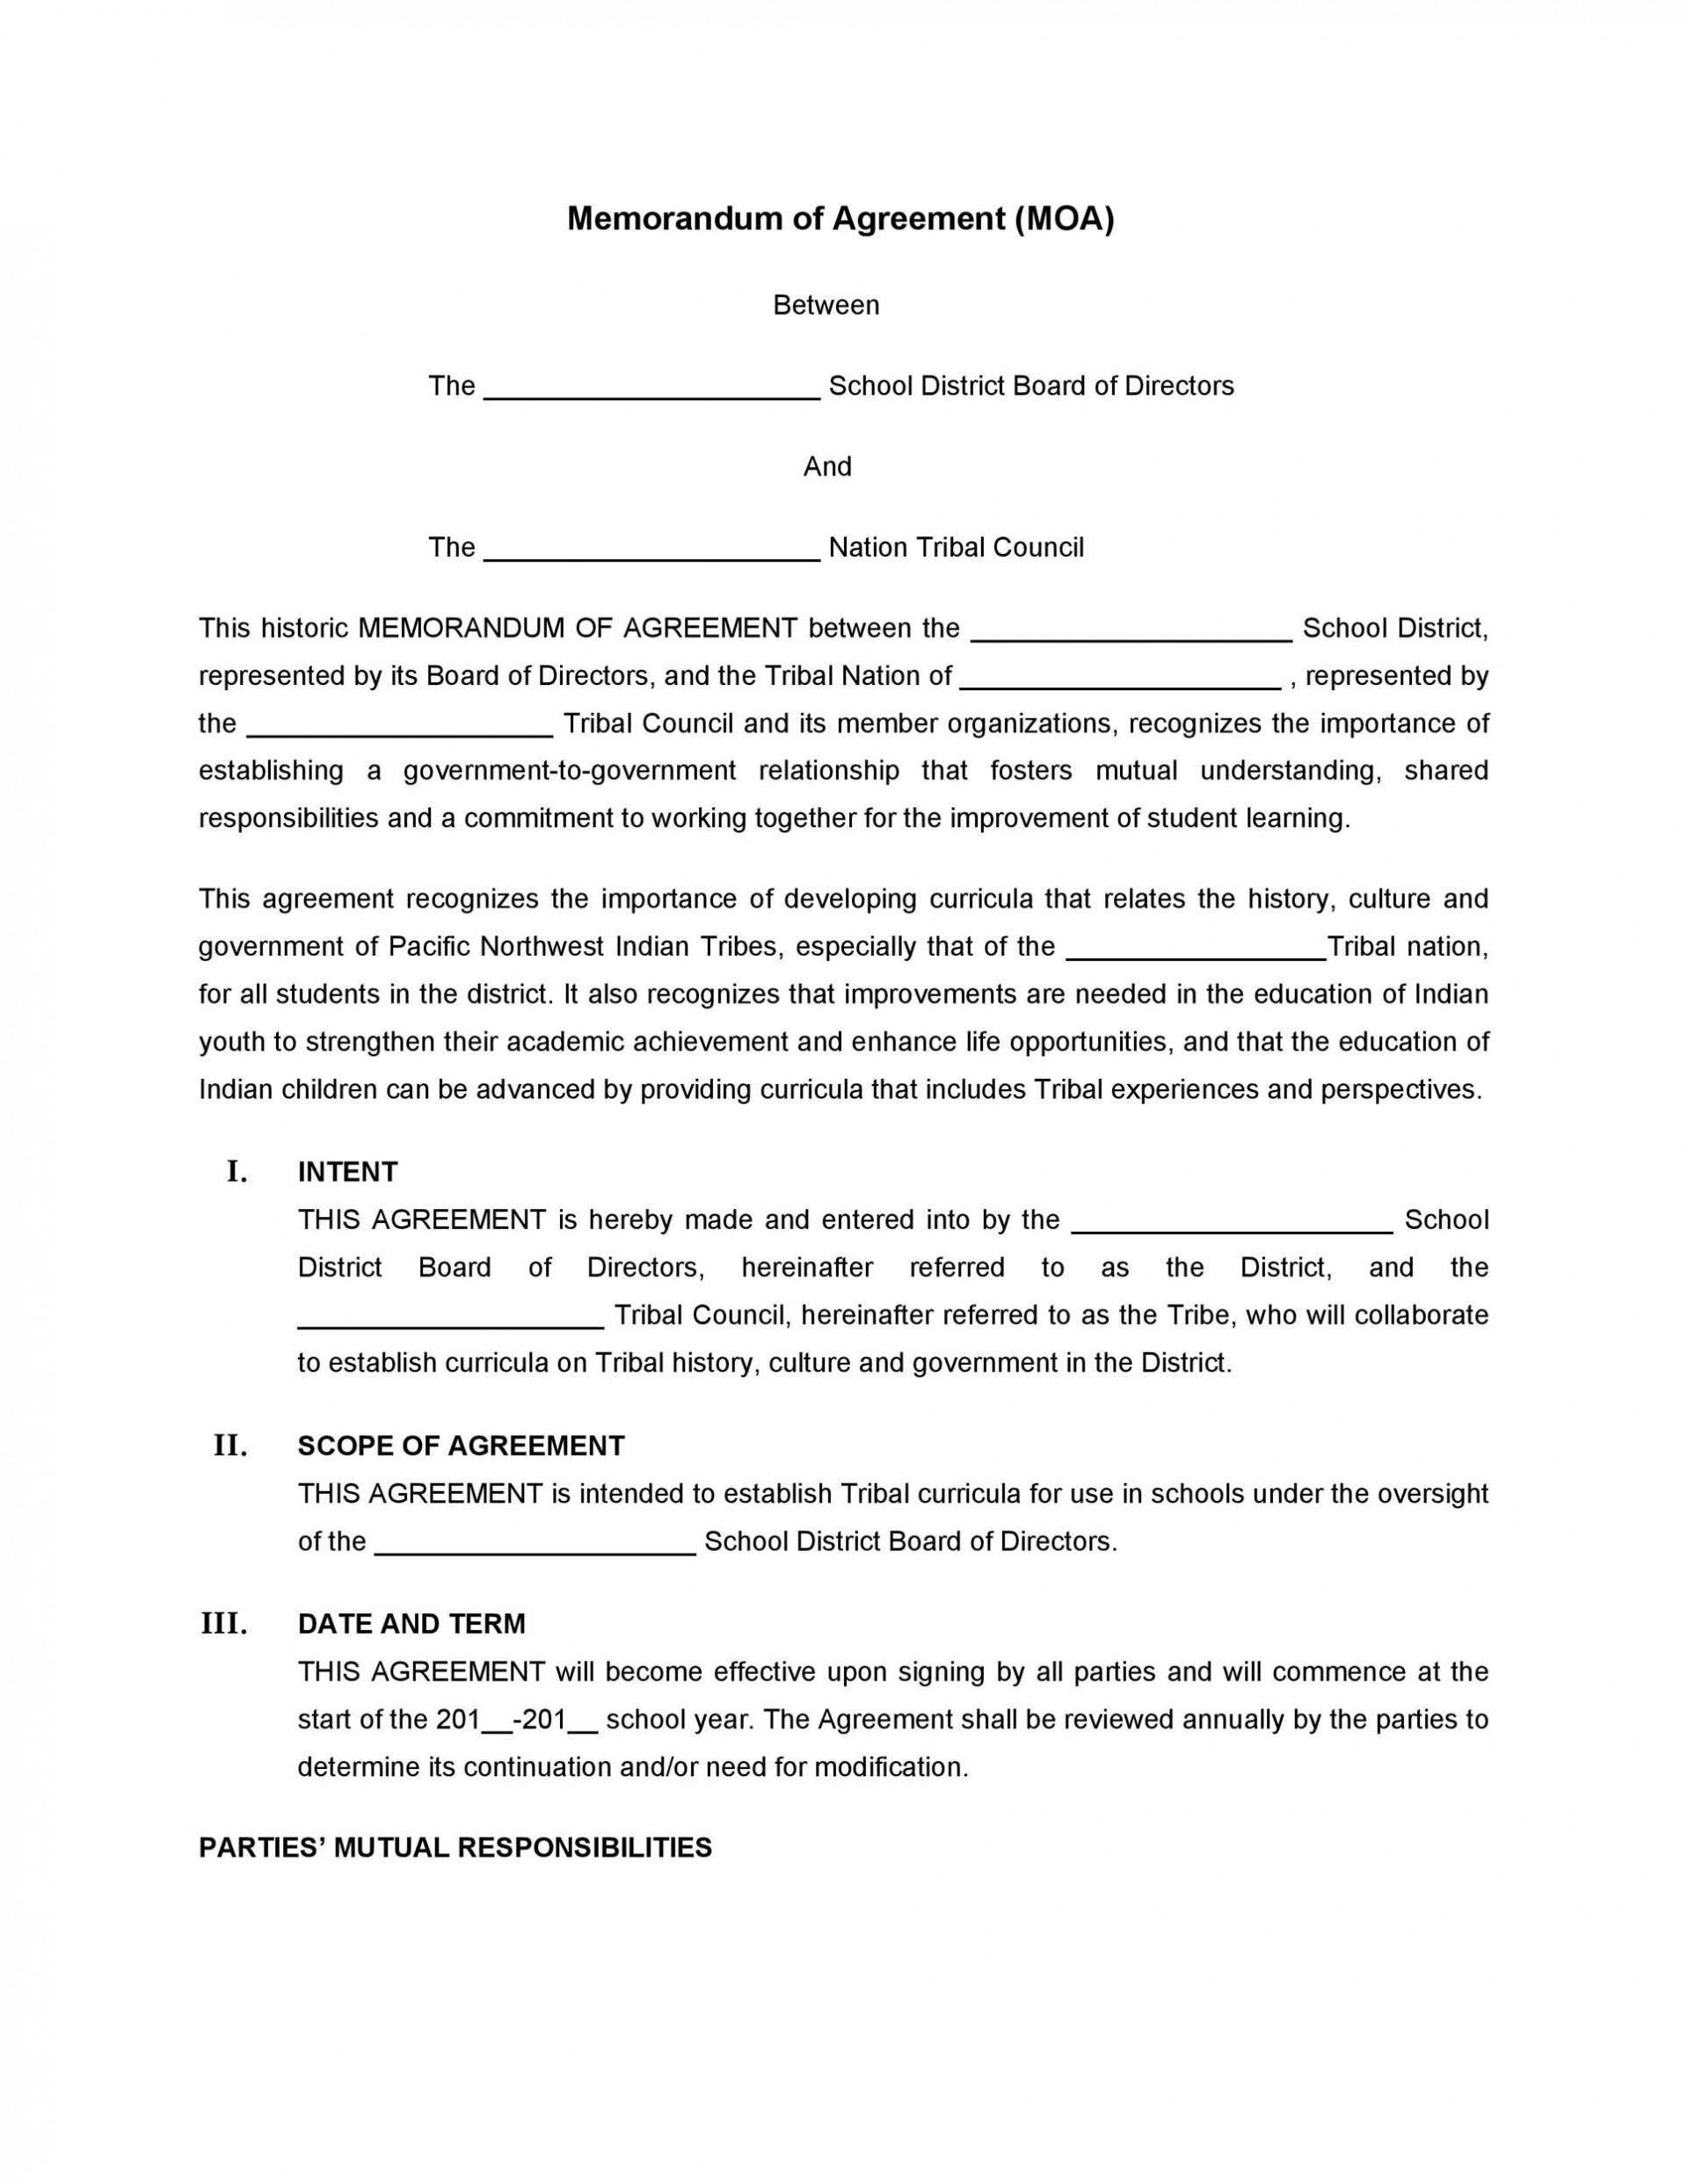 000 Phenomenal Private Placement Memorandum Outline High Resolution  Template Offering Sample Film1920